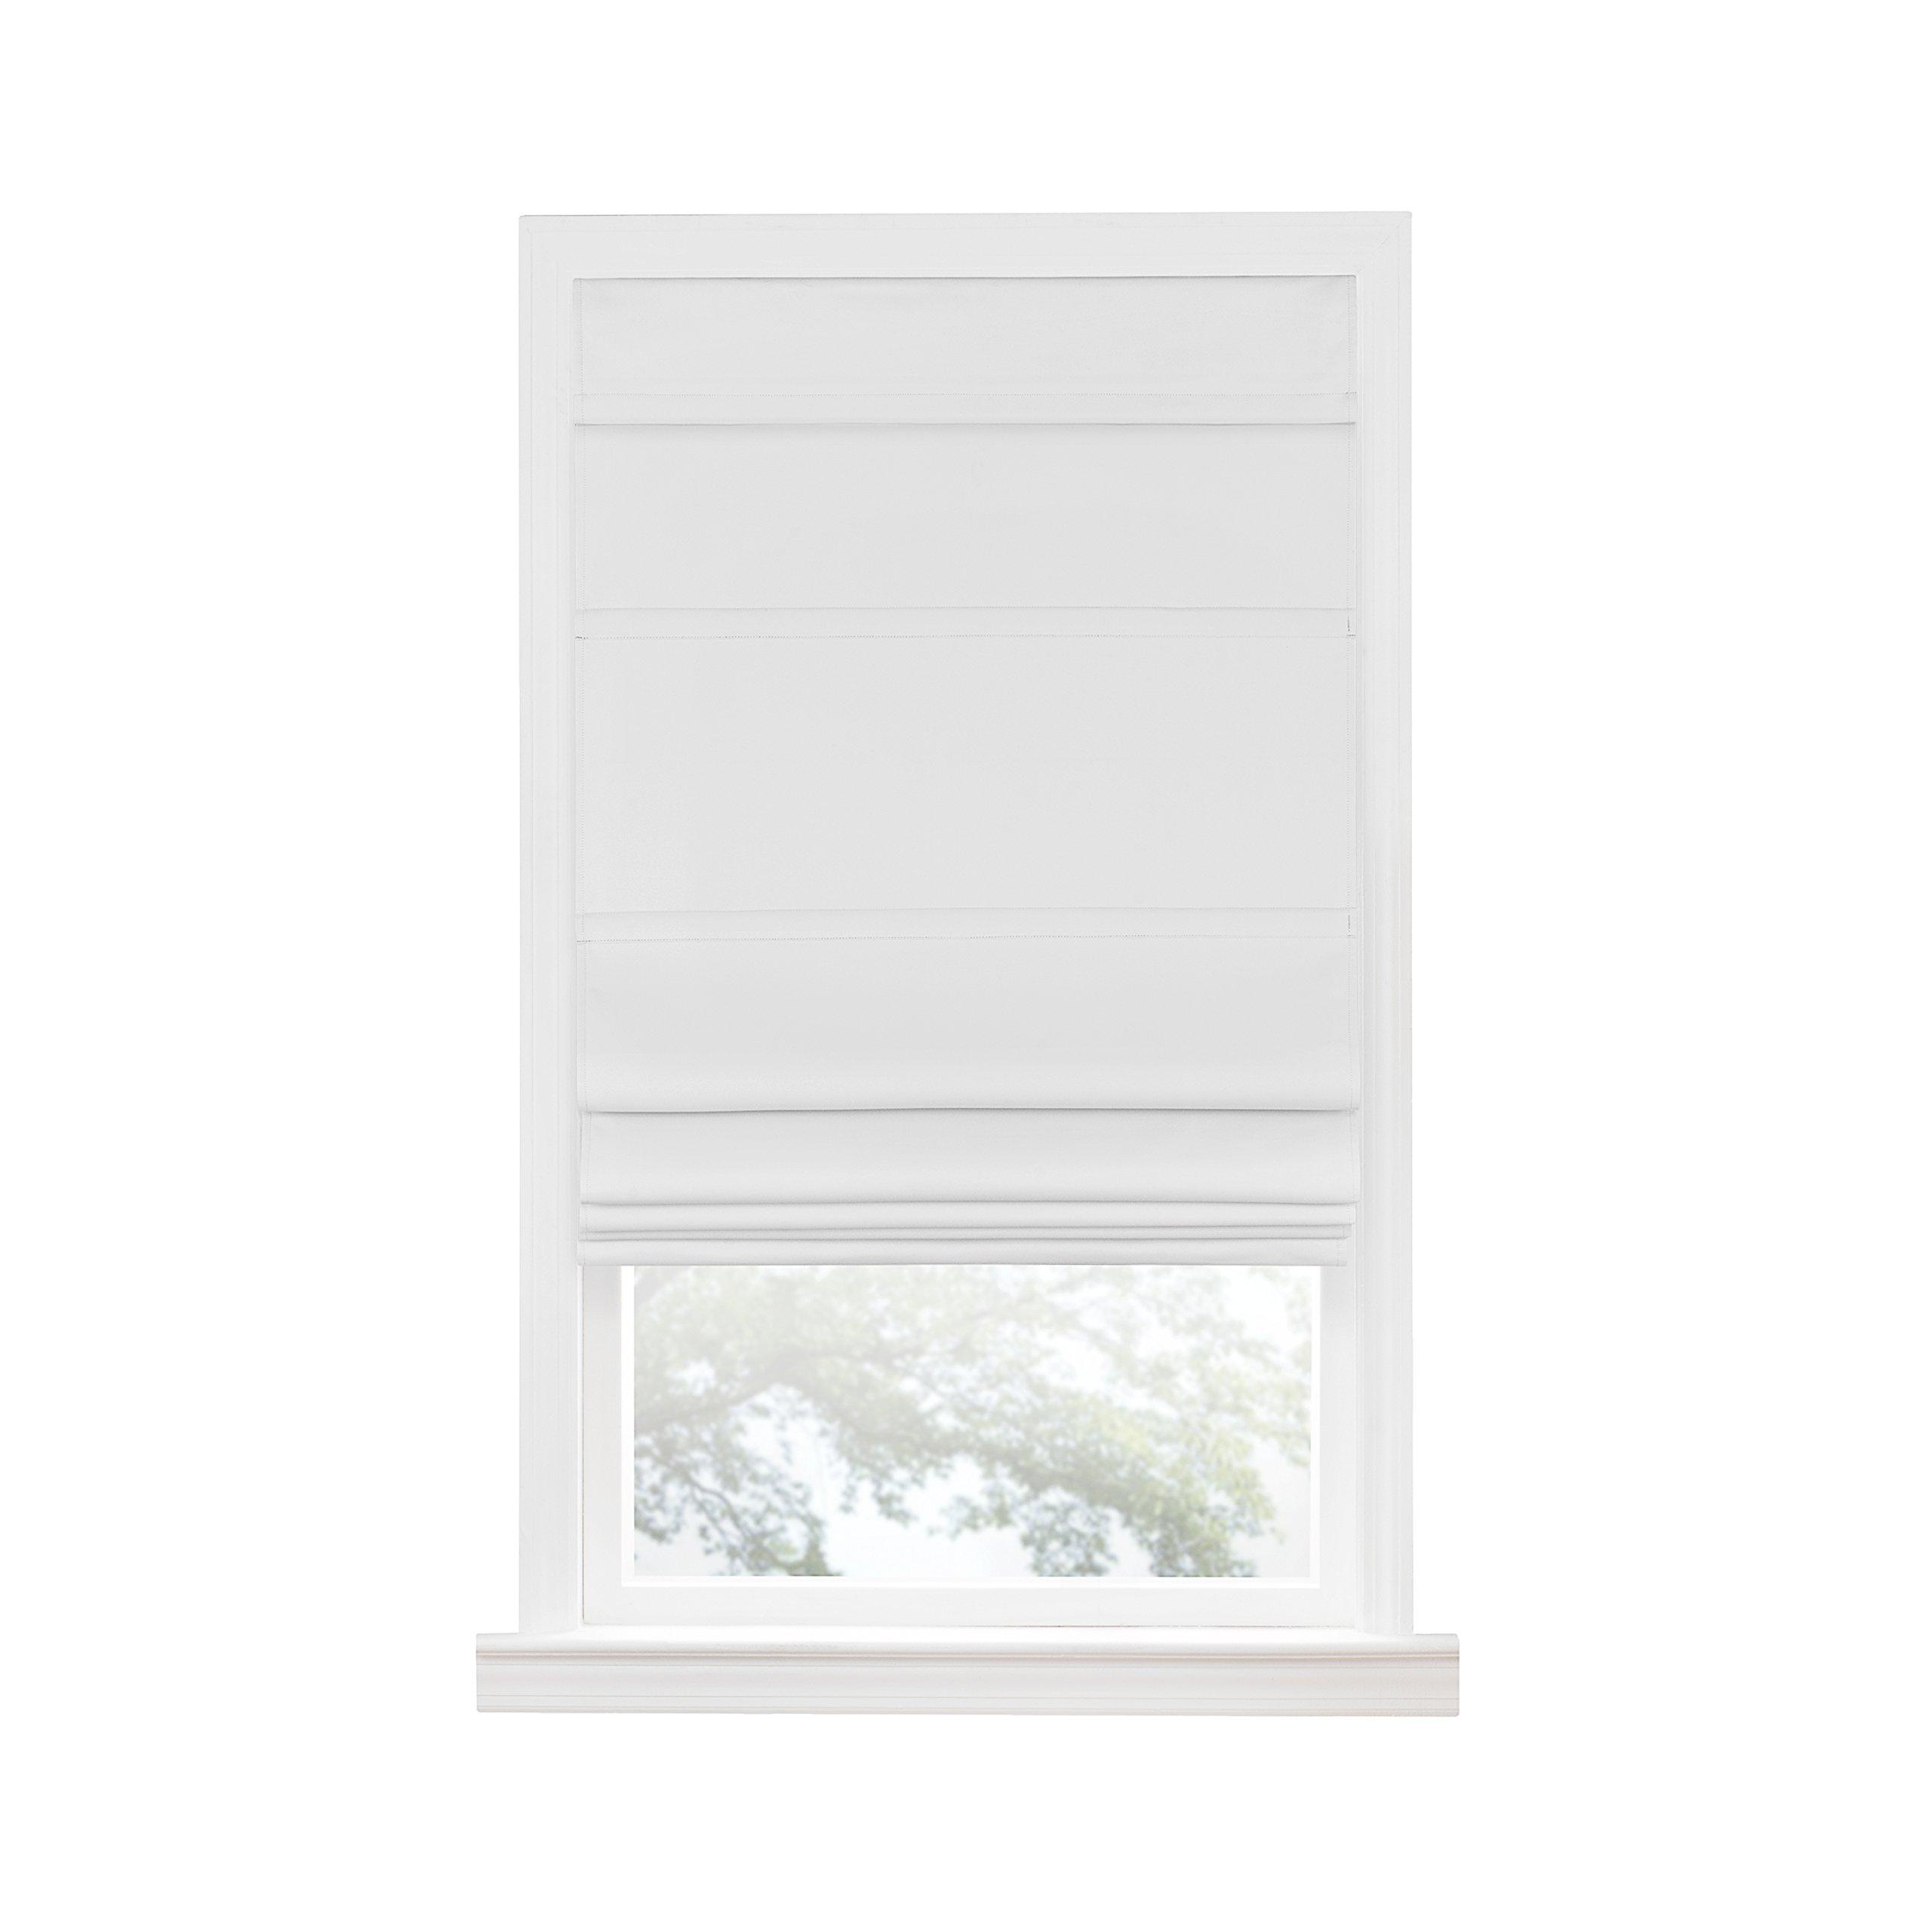 Achim Home Furnishings Achim Home Imports Cordless Blackout Window Roman Shade, 27'' x 64'', White by Achim Home Furnishings